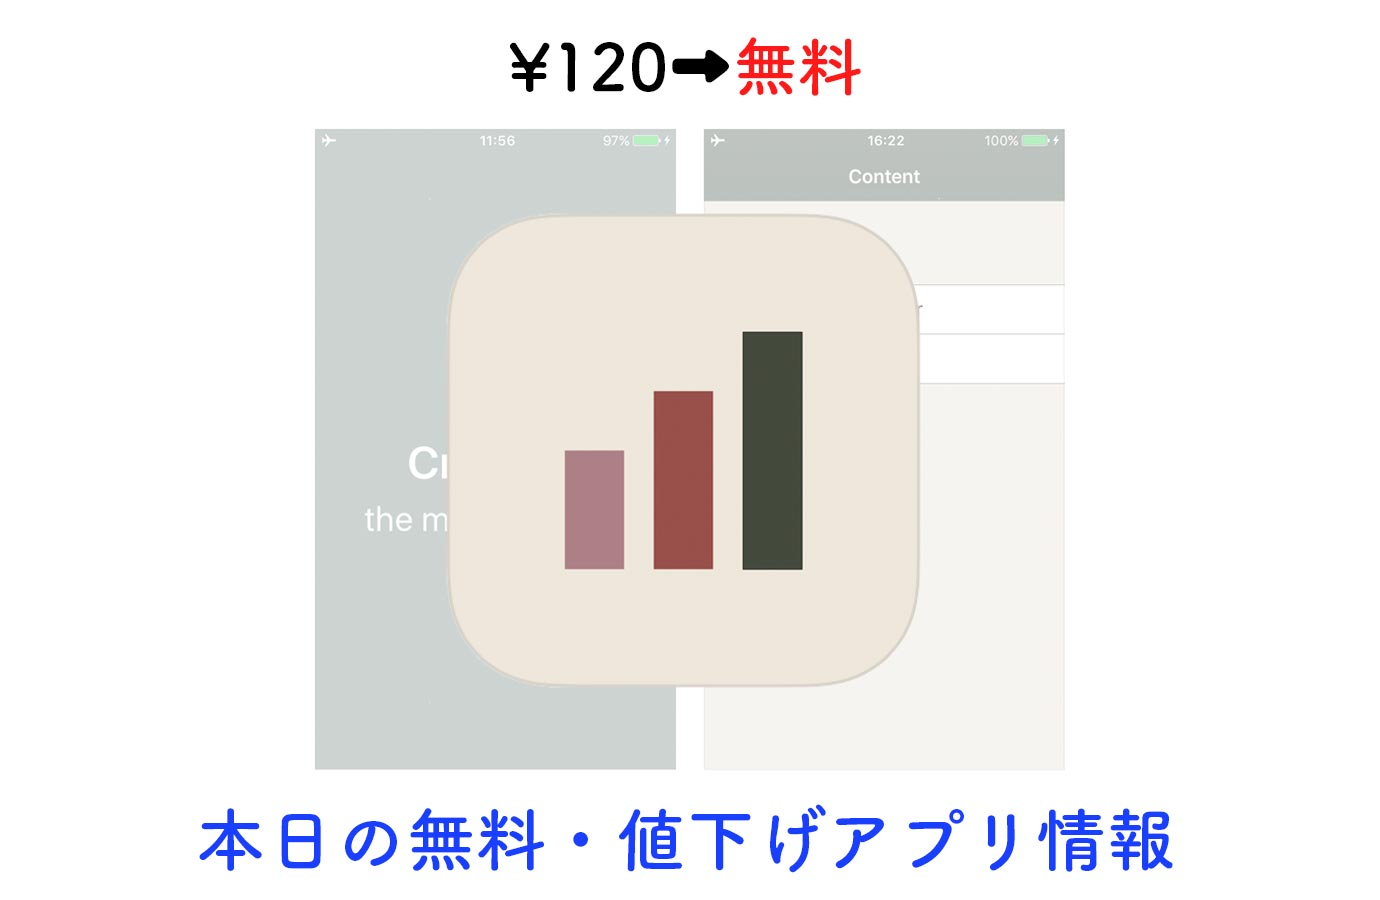 Appsale1020